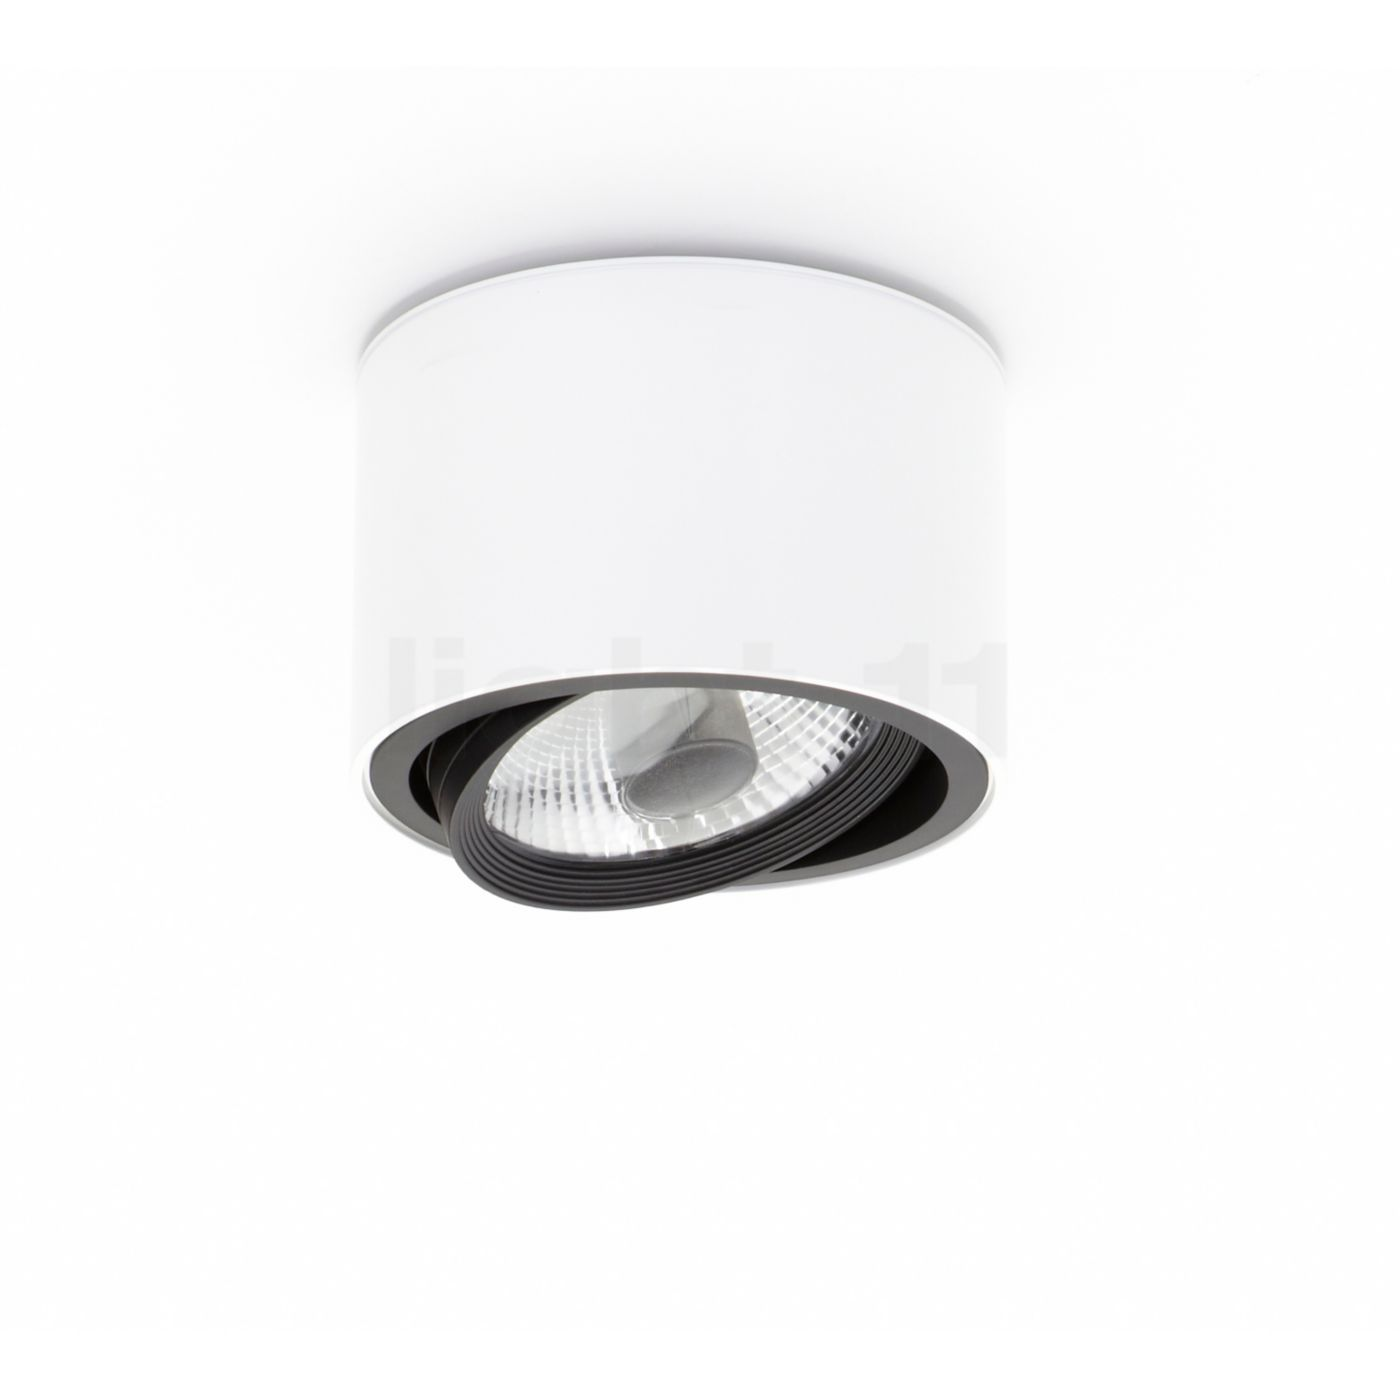 Mawa Design mawa design 111er ceiling light hv lightning floor